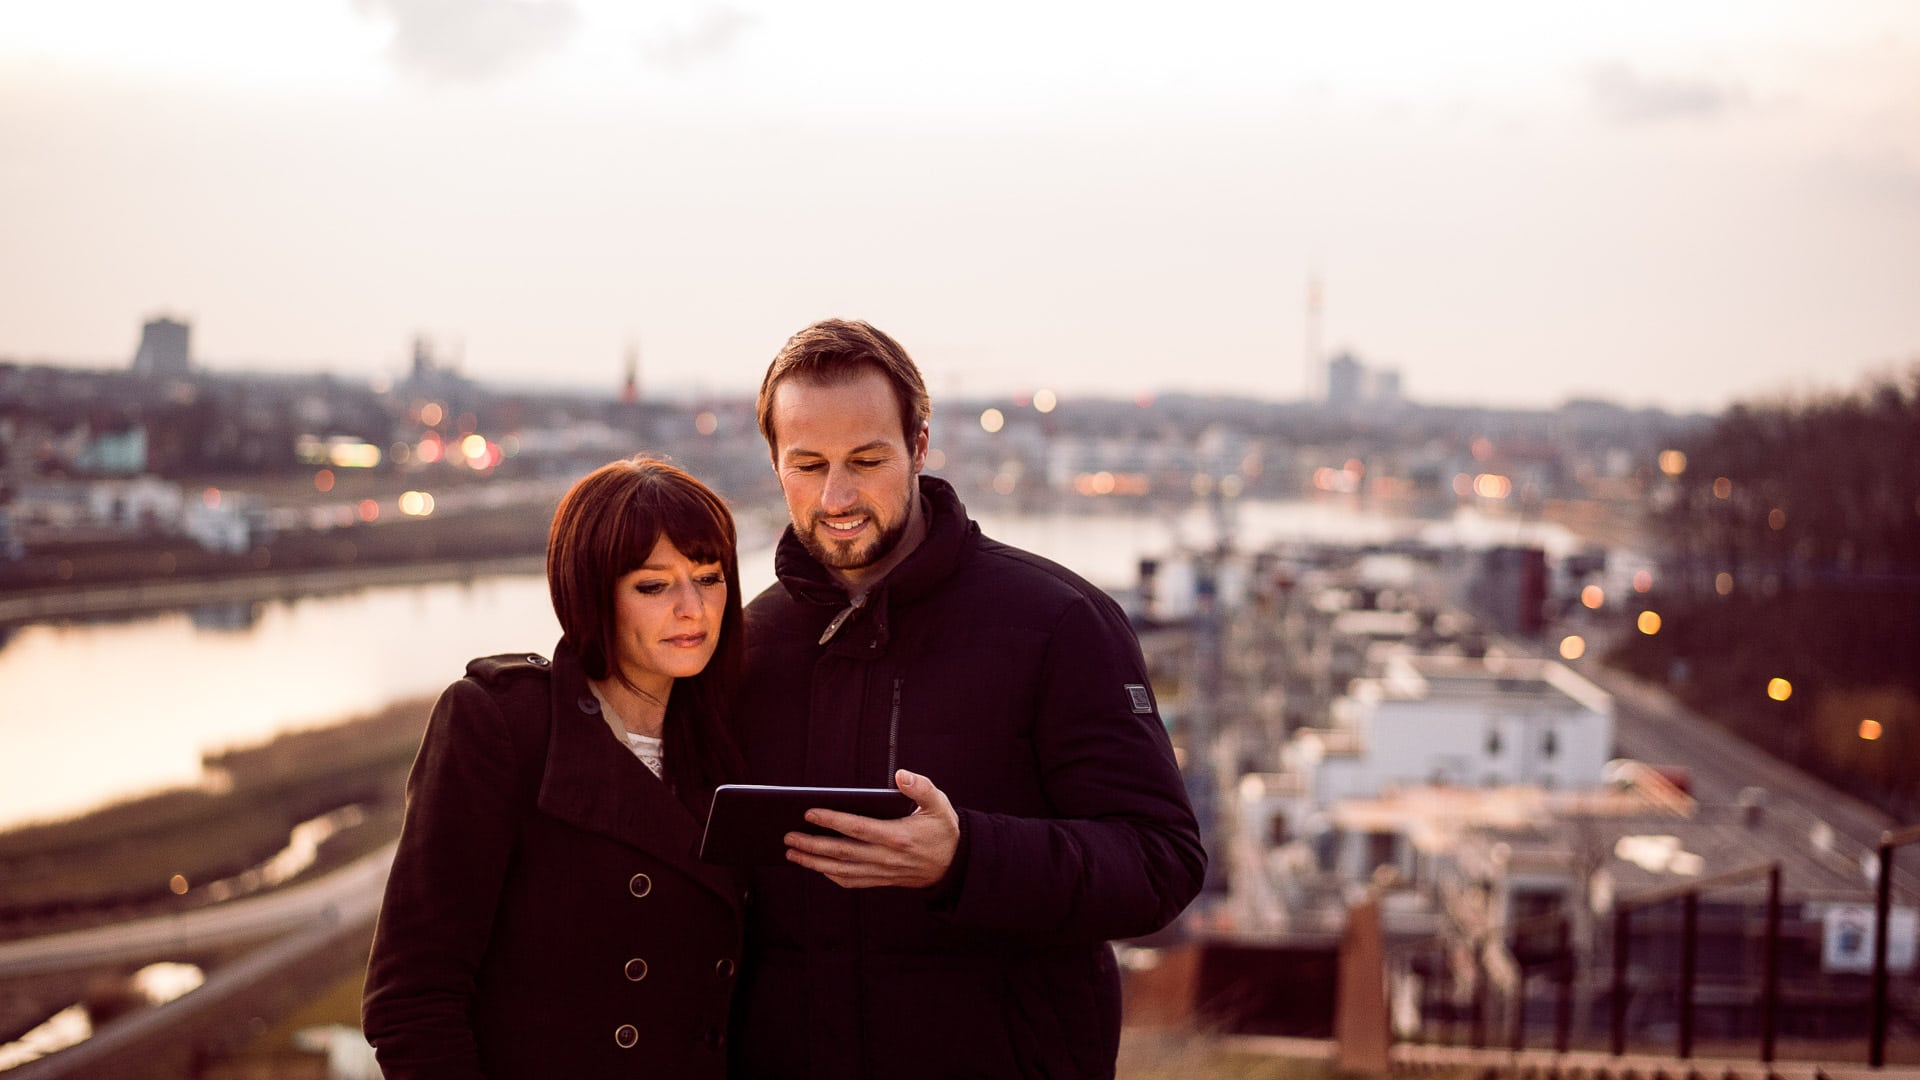 Werbefotograf Markus Mielek shootet Portraits eines Paares am Phönixsee Dortmund